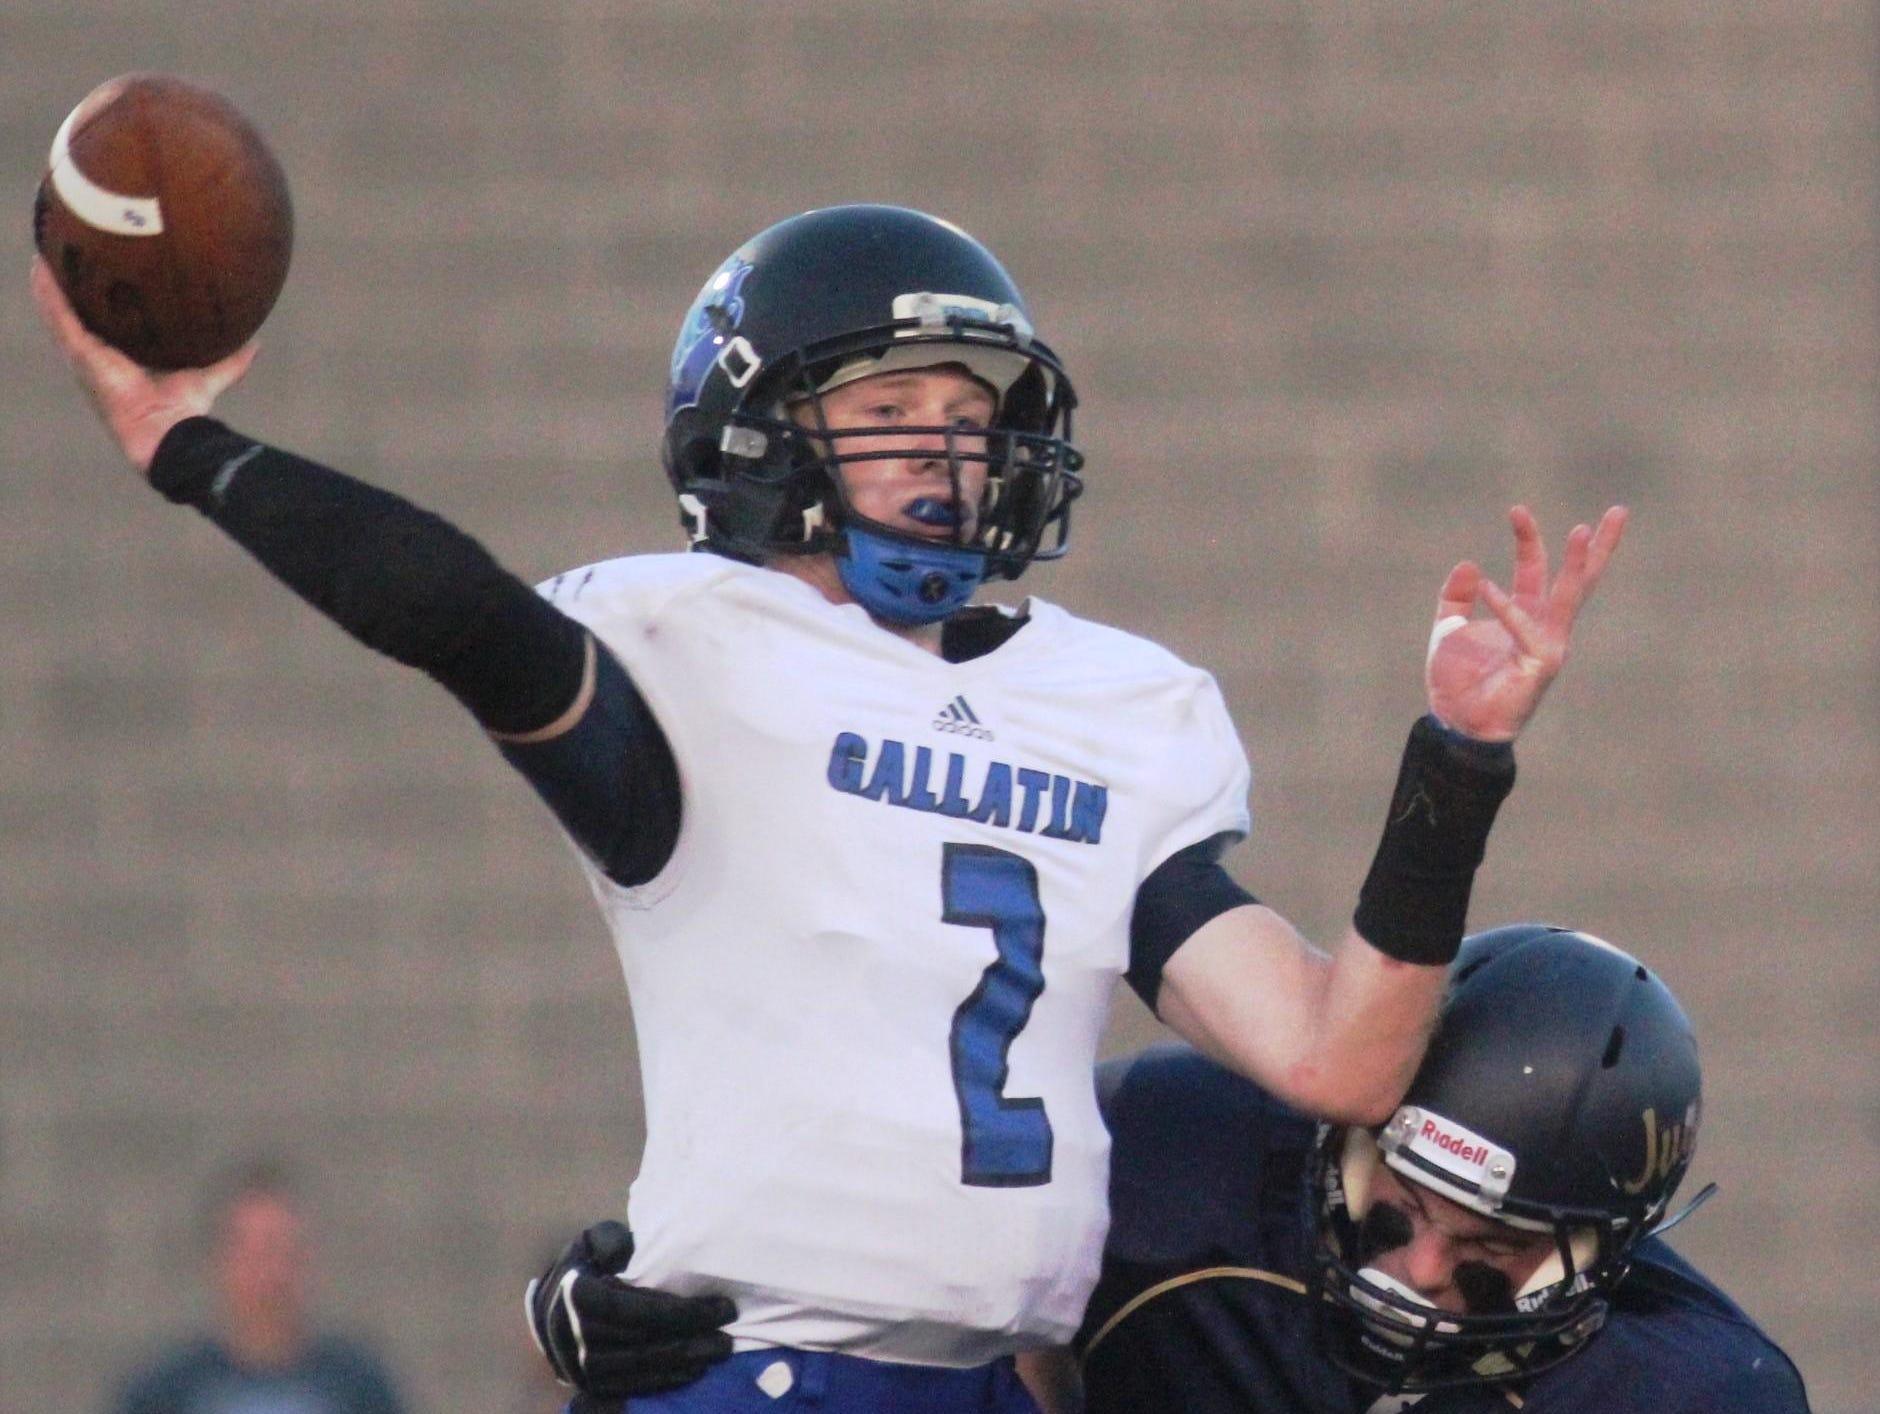 Trent Brock returns under center for Gallatin County.